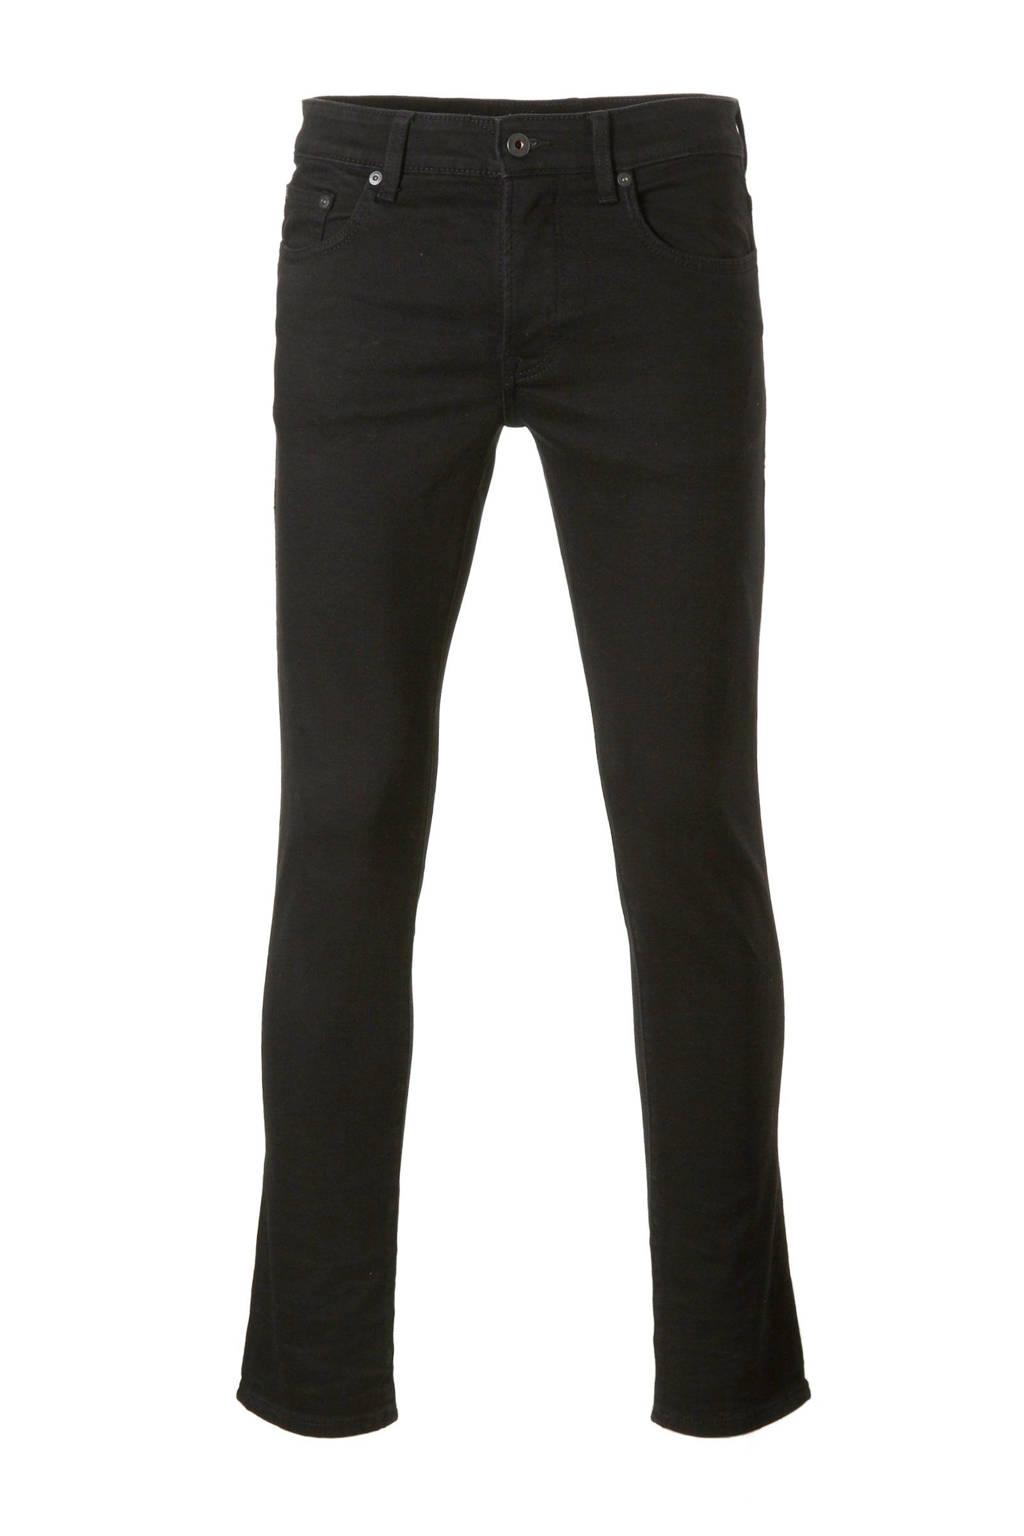 C&A The Denim slim fit jeans, Zwart